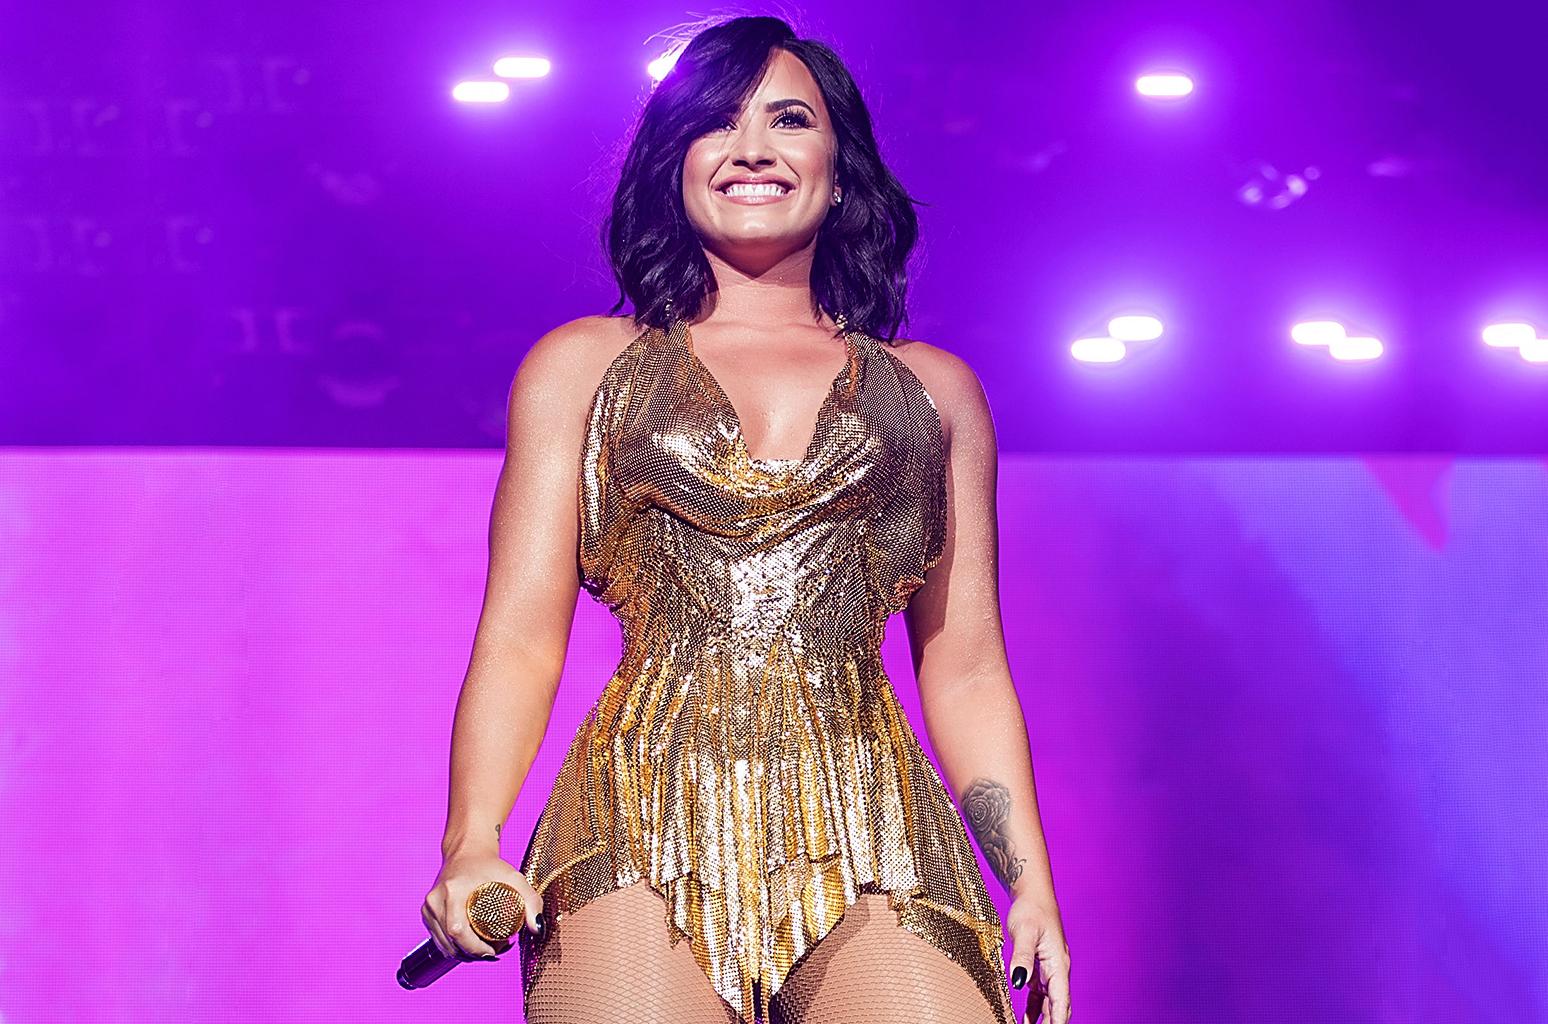 Demi Lovato Bikini - 50 Bilder - xHamstercom